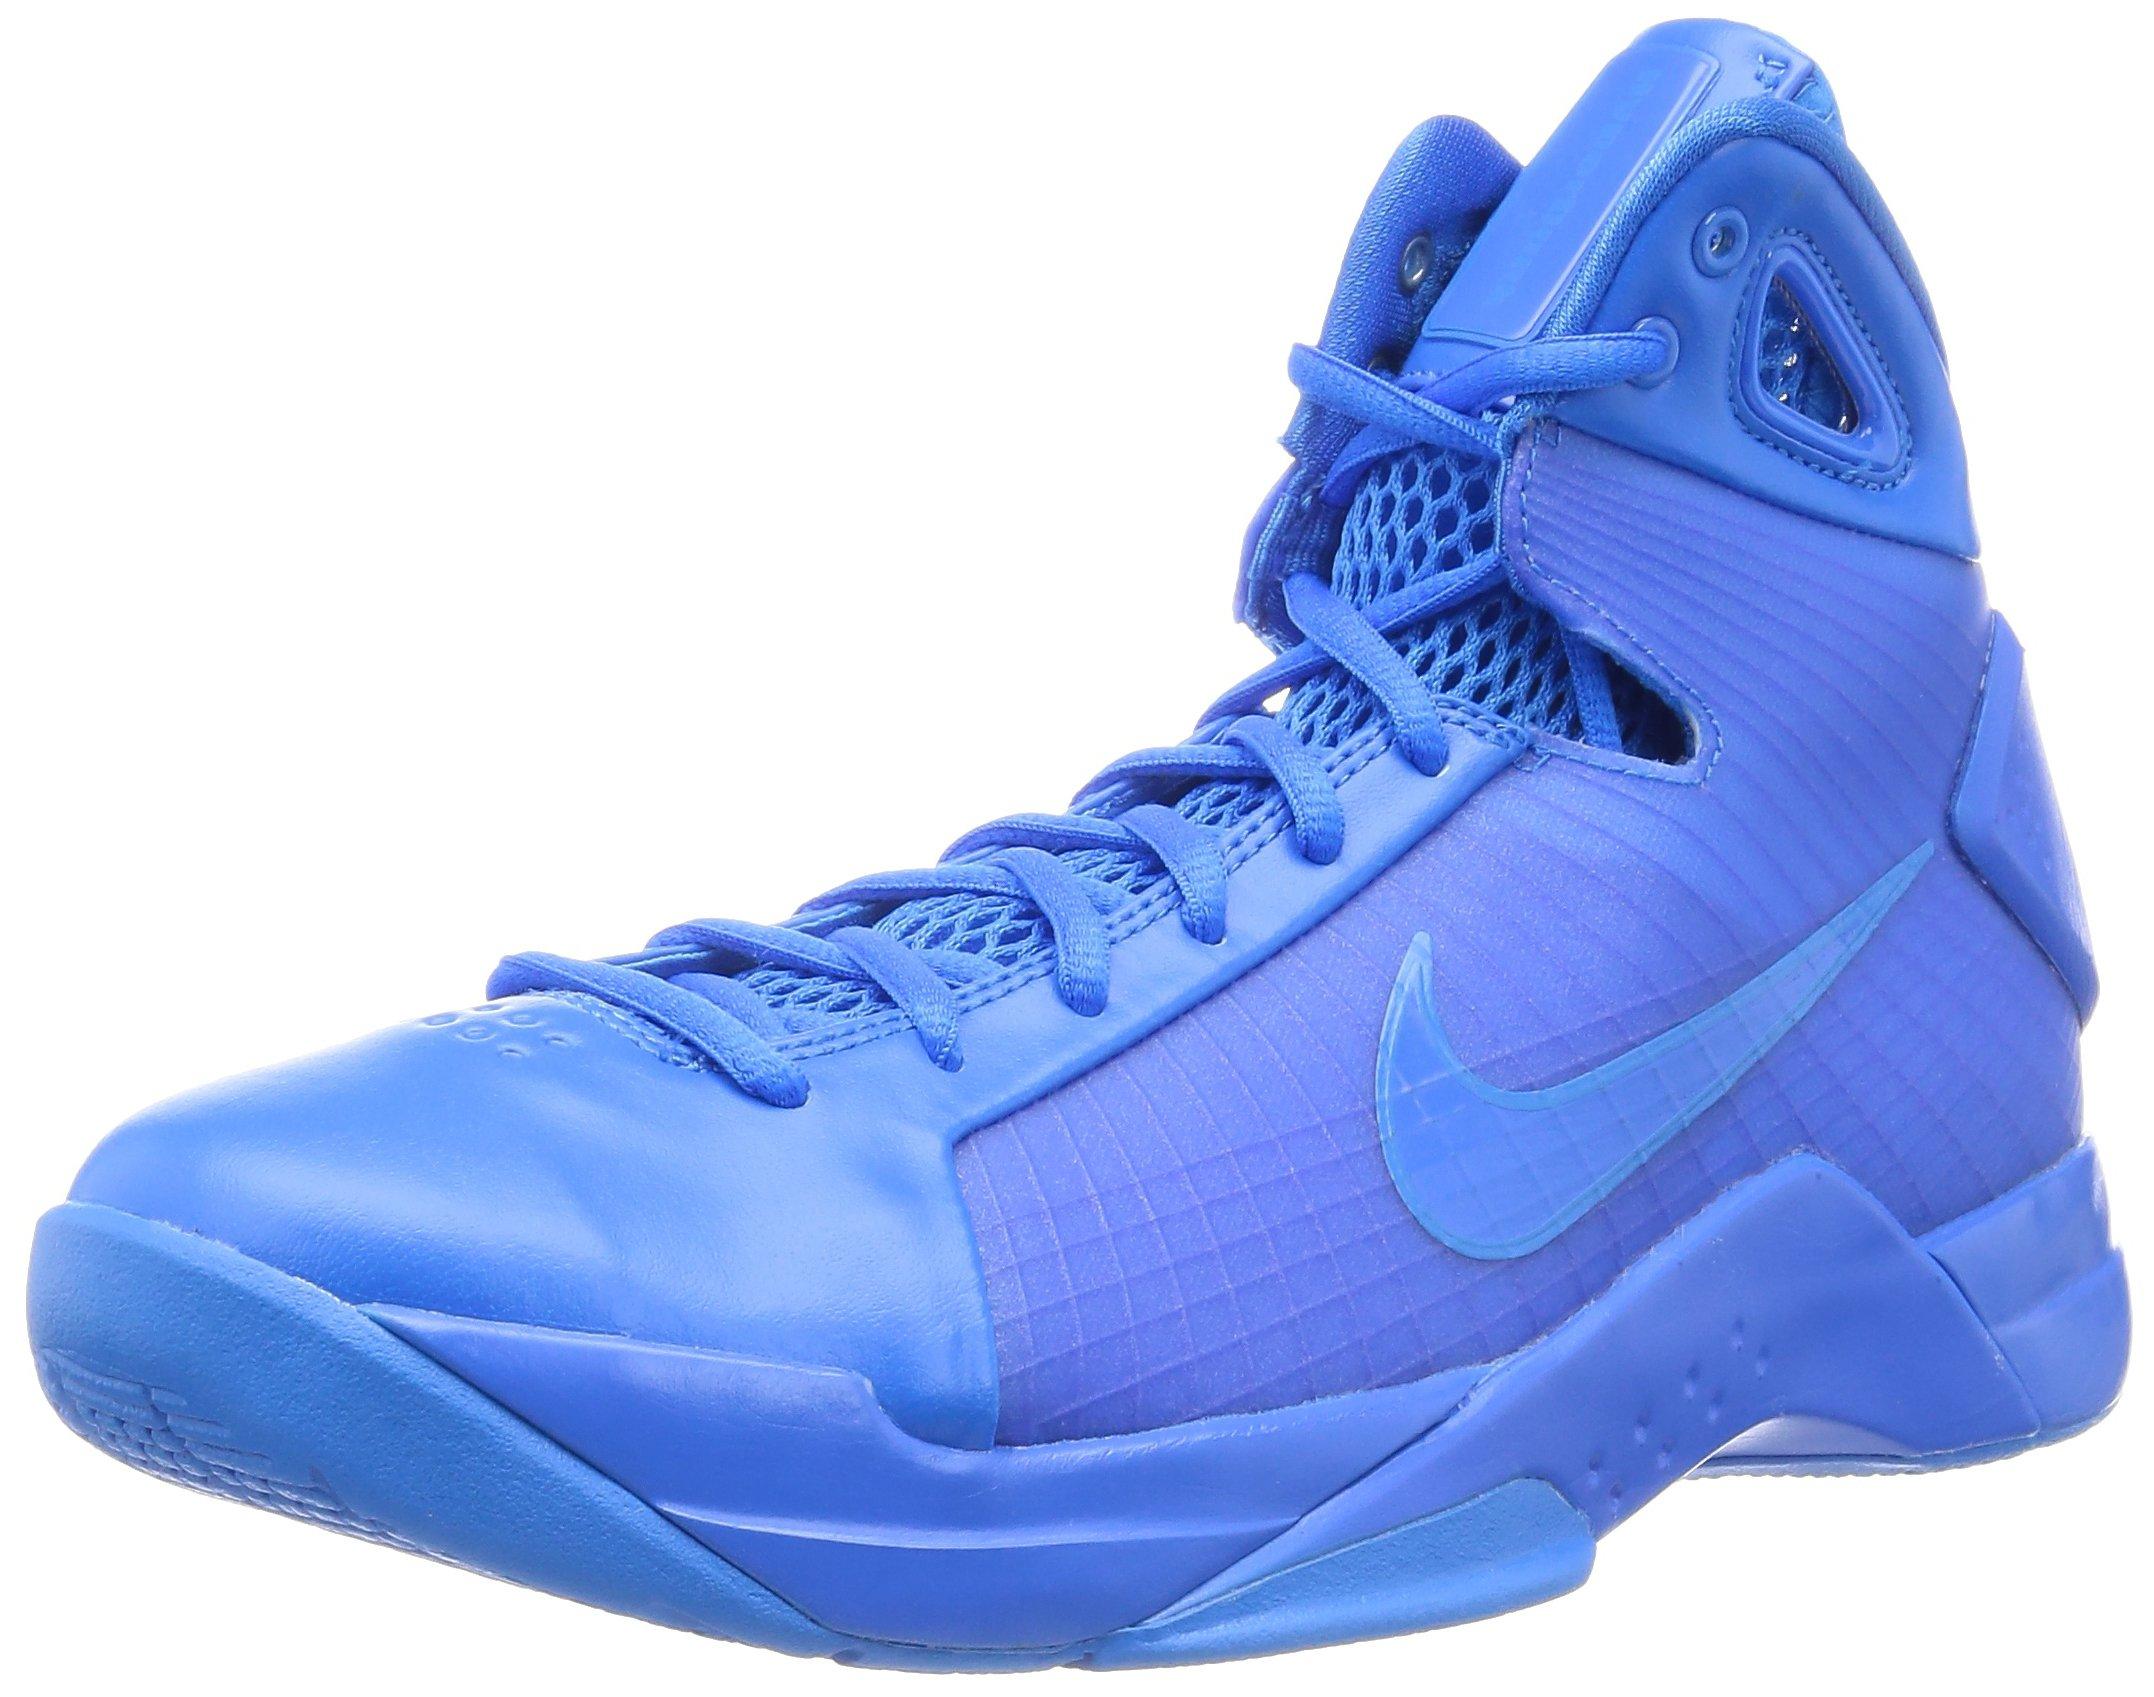 75cb460a881d Galleon - Nike Mens Hyperdunk 08 Photo Blue Photo Blue Pht Blue Basketball  Shoe (9)